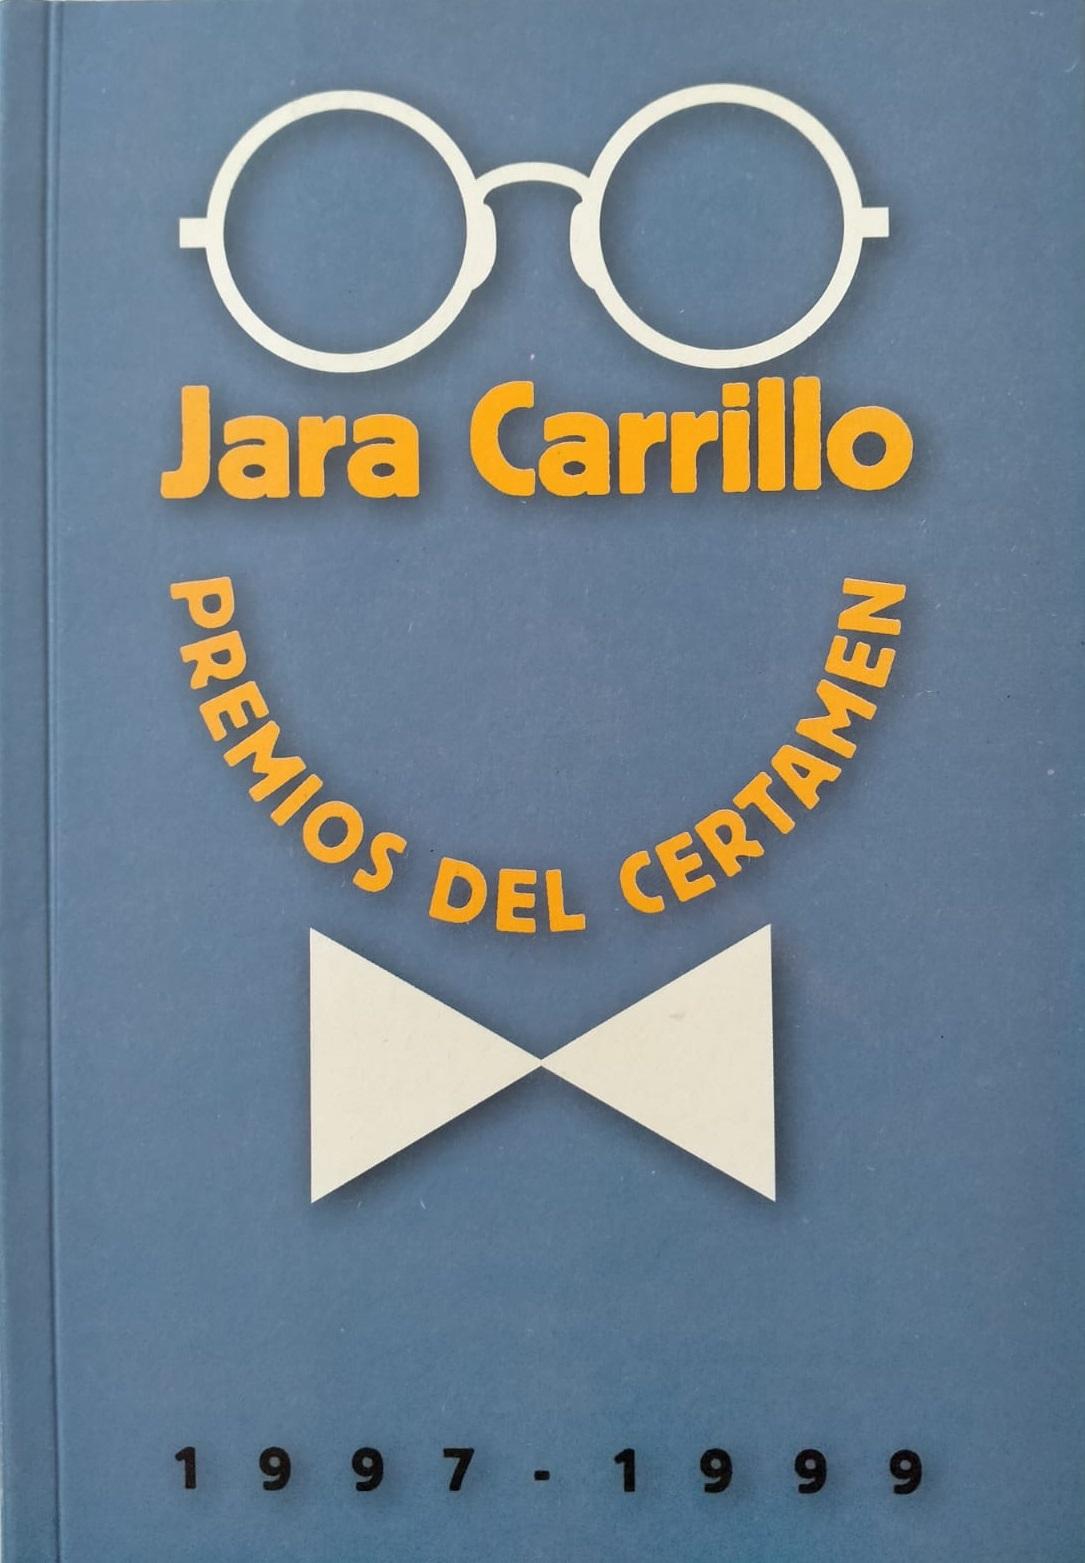 20201006 FOTO Jara Carrillo